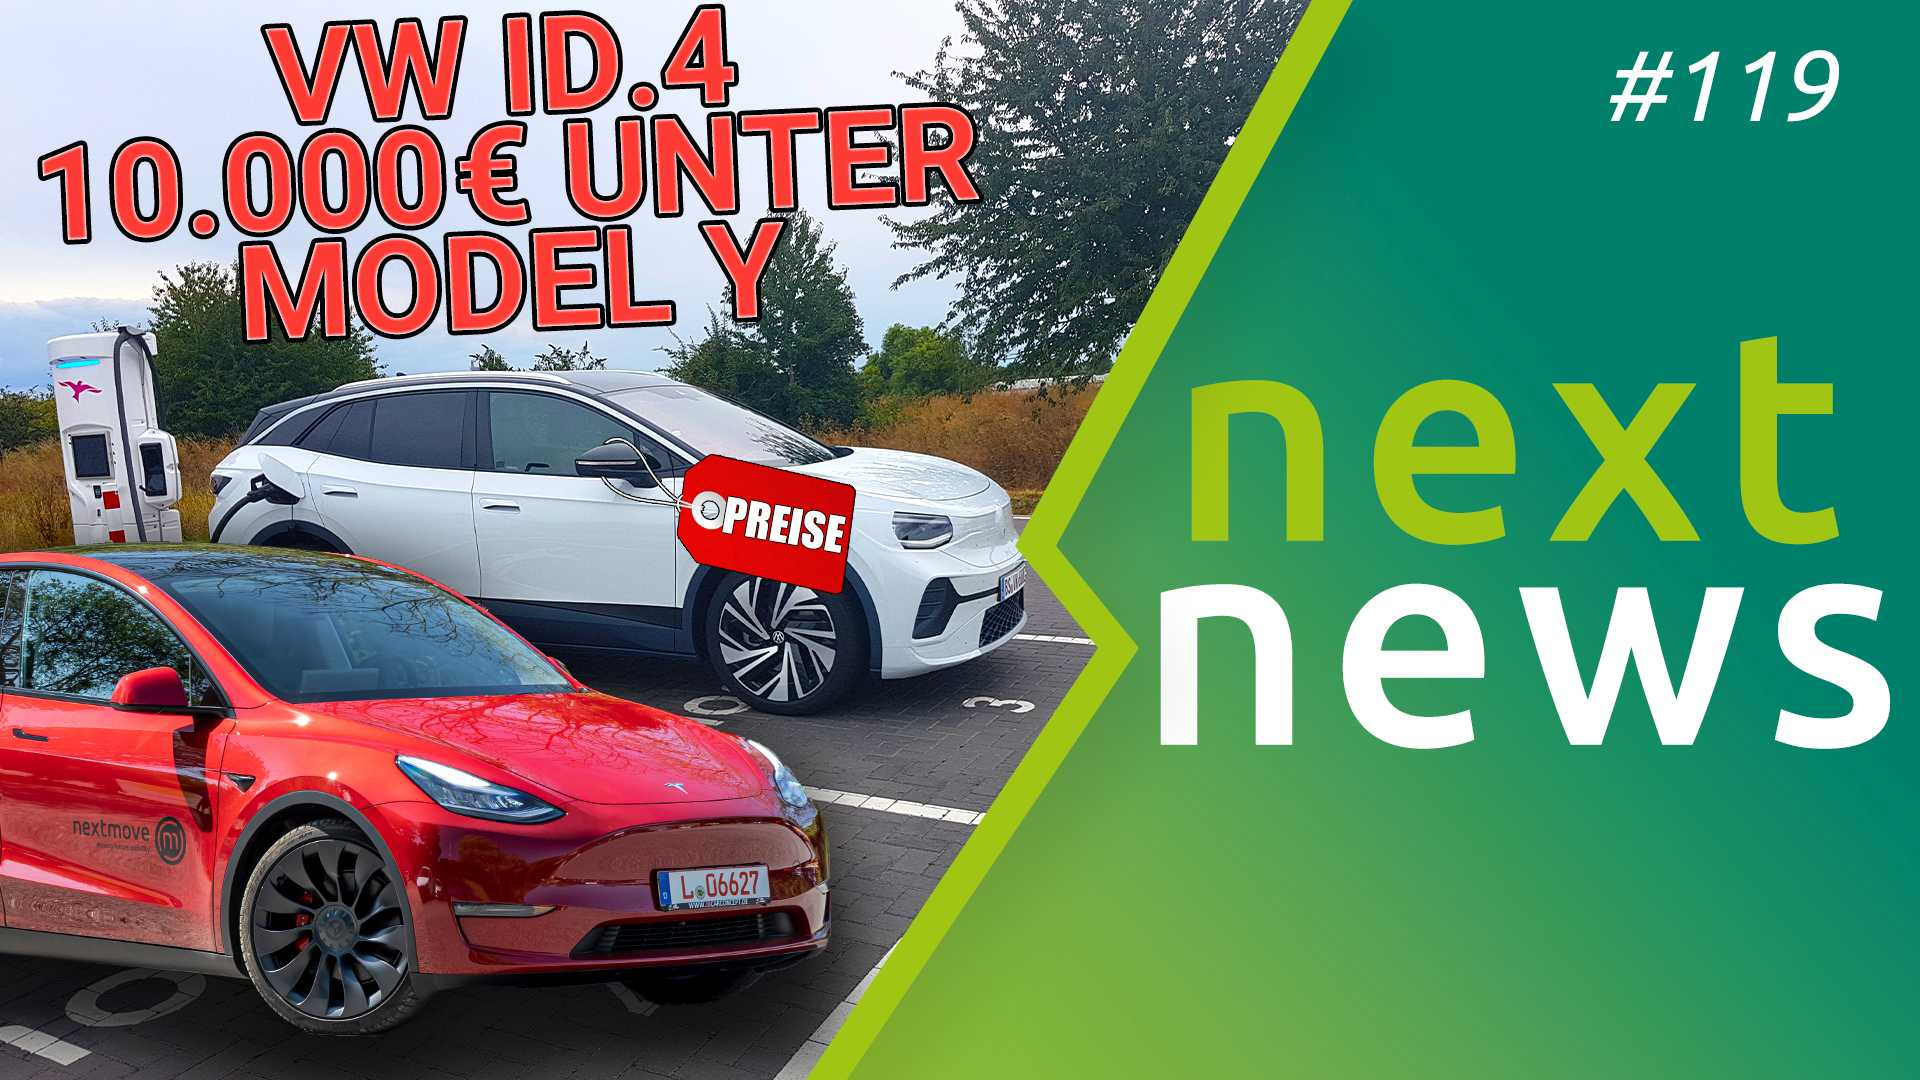 nextnews #119 mit Skoda Enyaq Tesla Model Y und VW ID.4